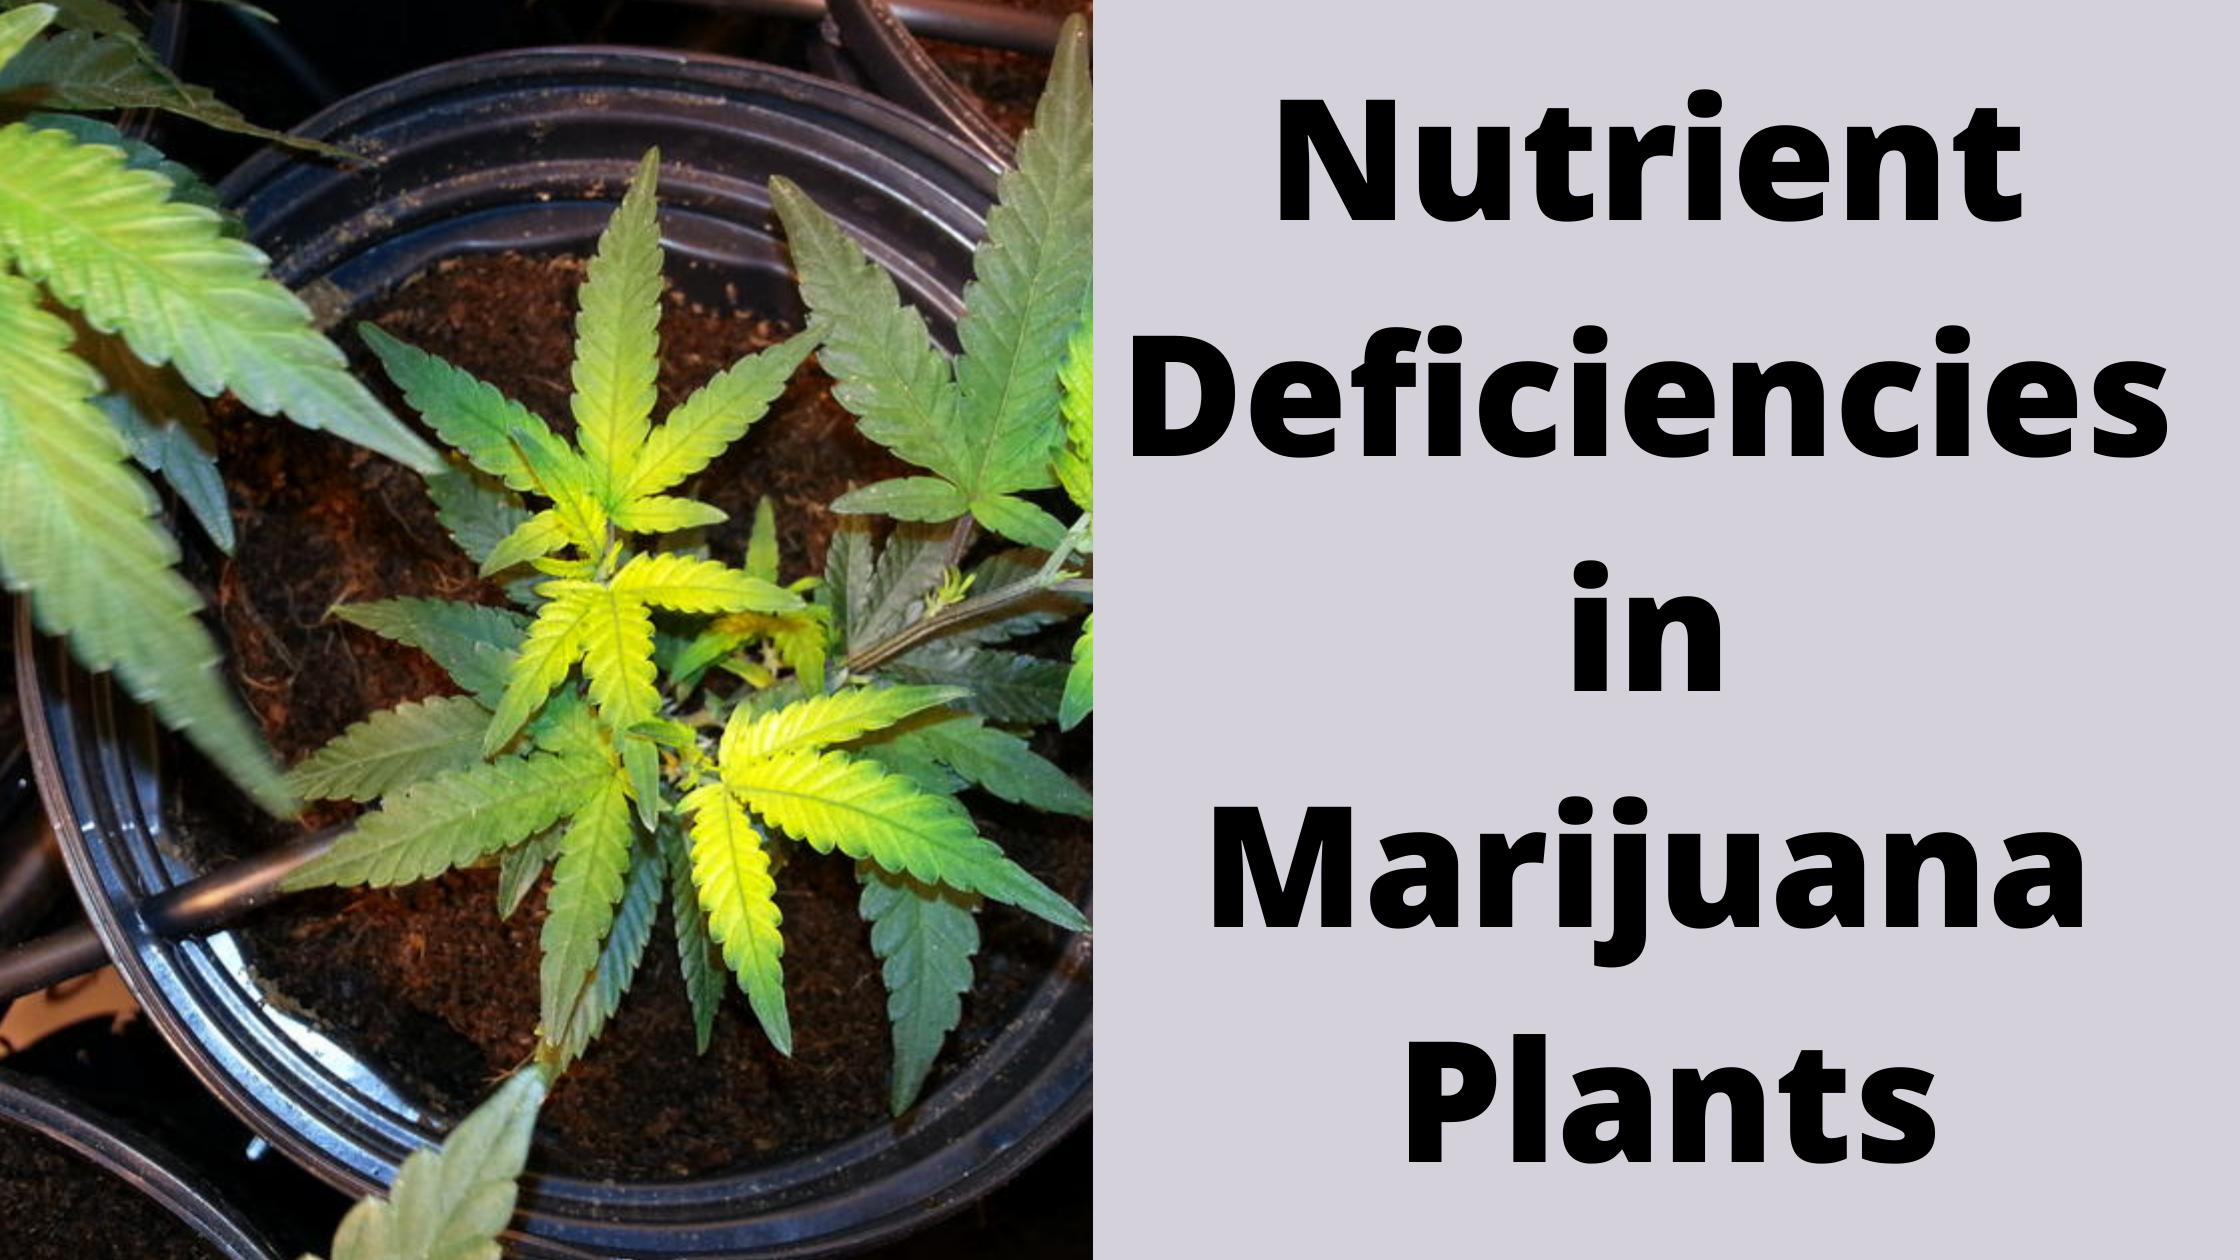 Nutrient Deficiency in Marijuana Plants